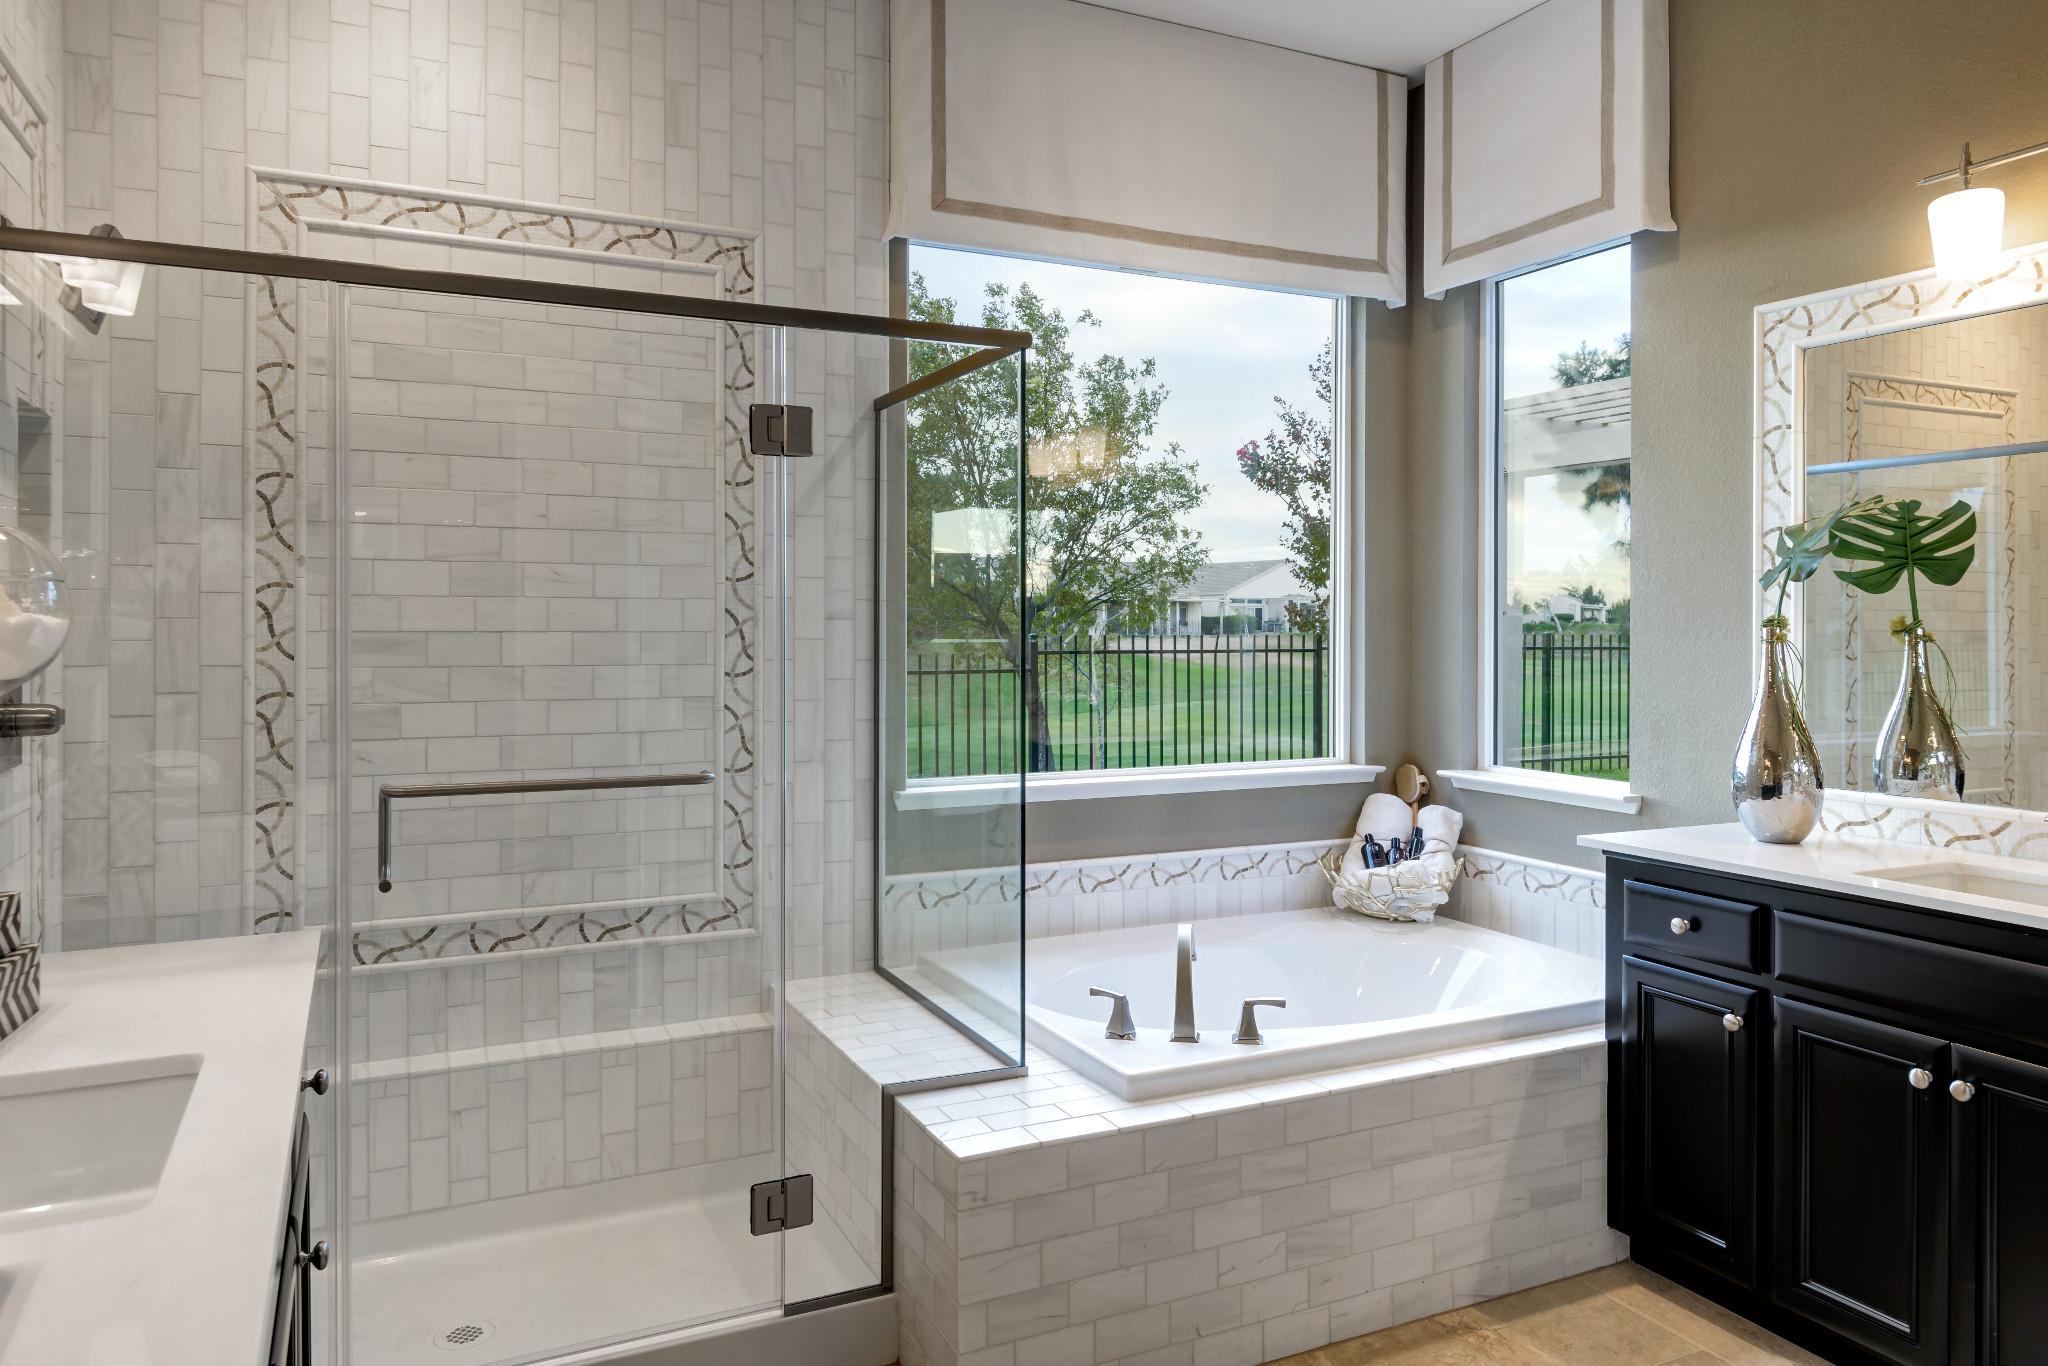 Trilogy Rio Vista Vensa Master Bathroom